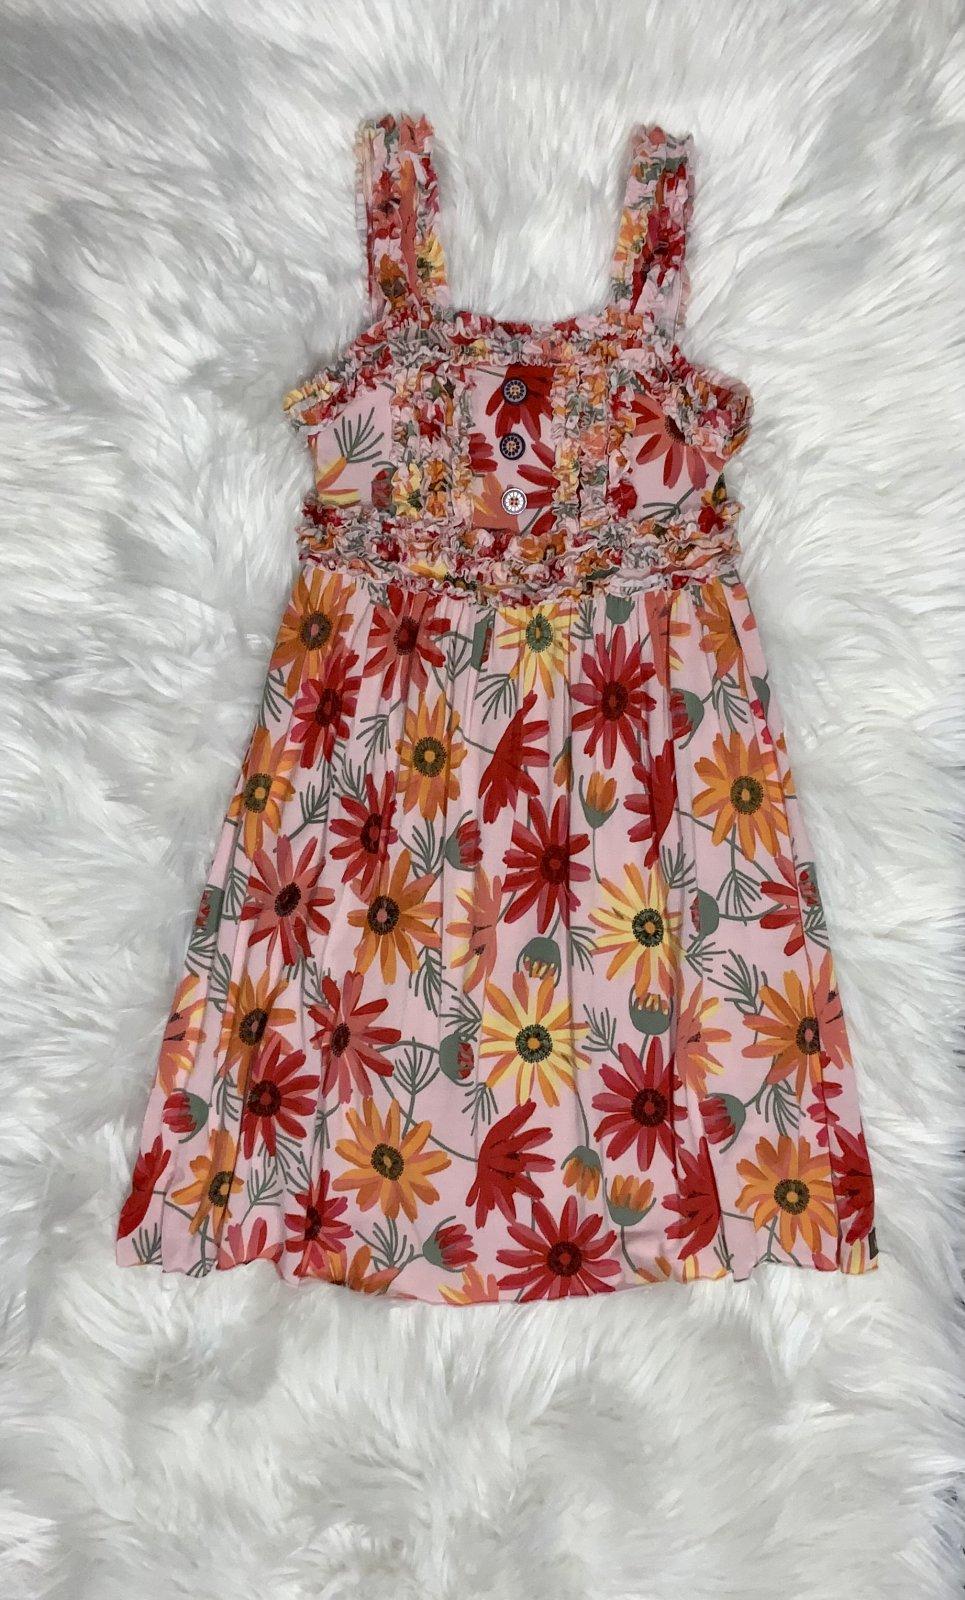 MATILDA JANE DRESS PINK FLORAL NS SIZE 6